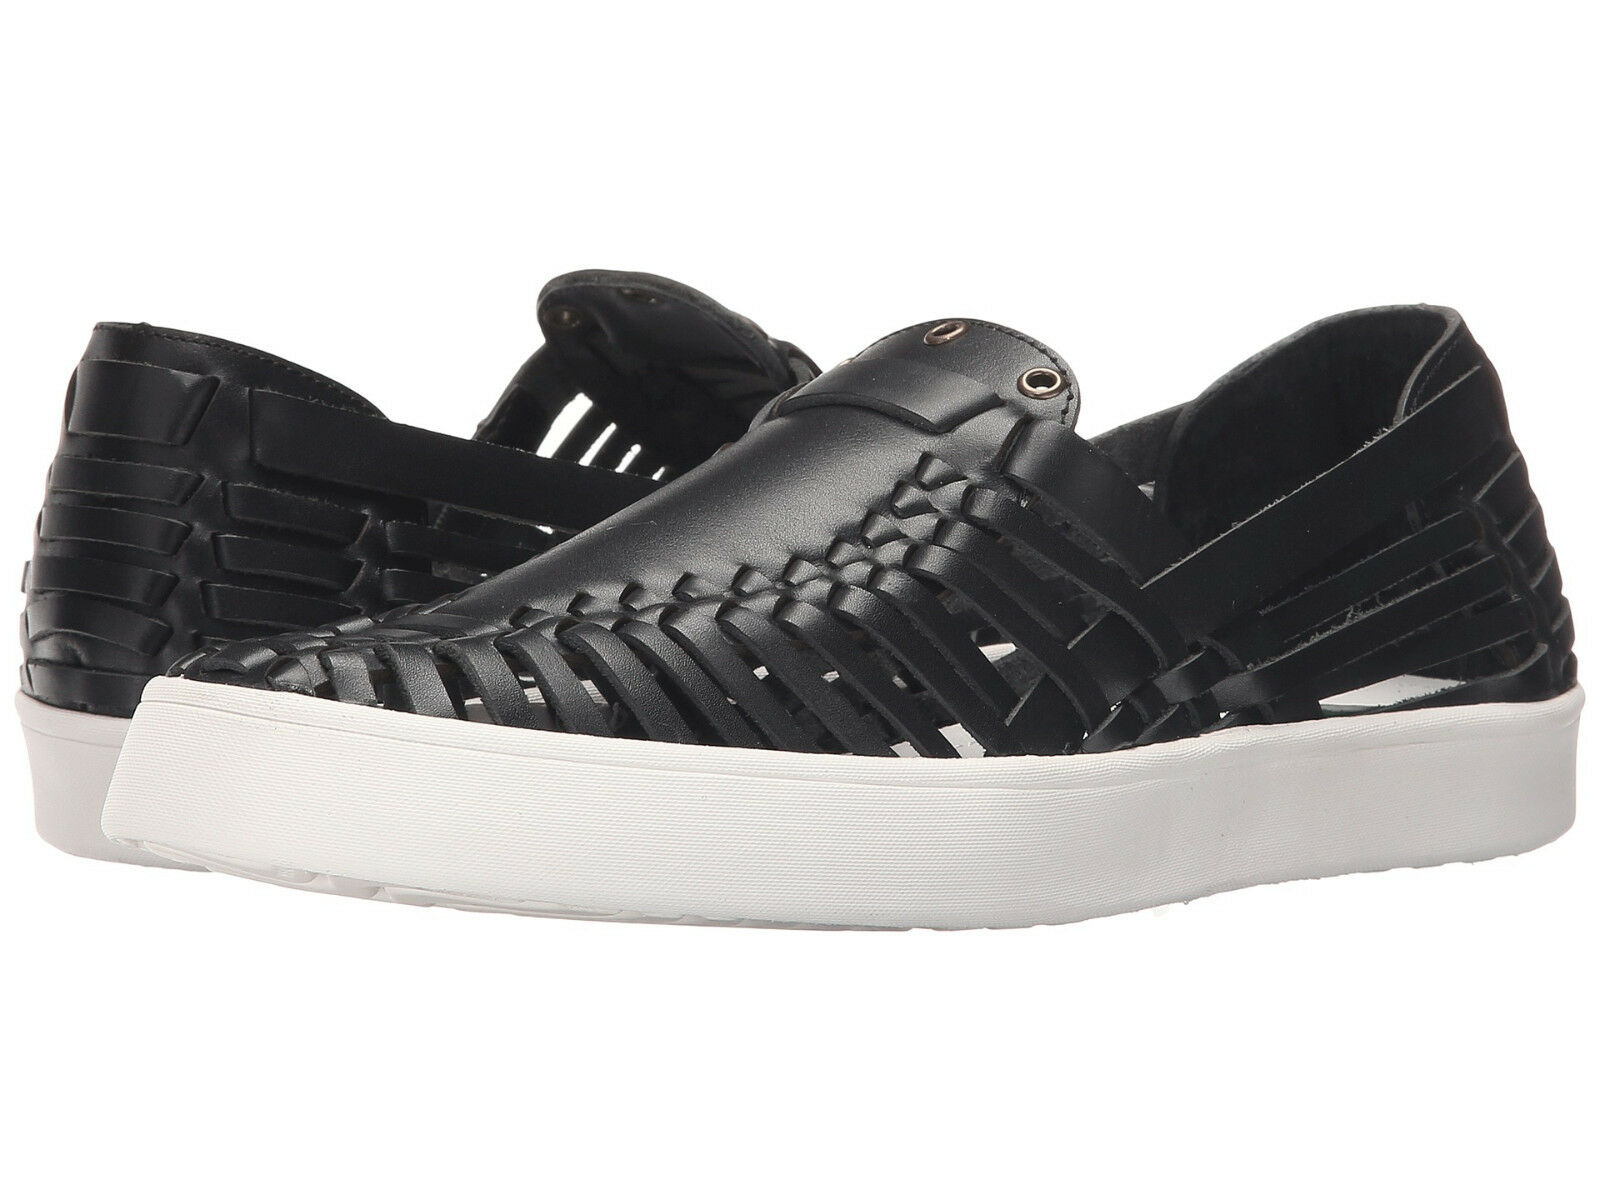 10 Crosby Derek Lam Lia Woven Vachetta Leather Huarache Style Slip On New 8